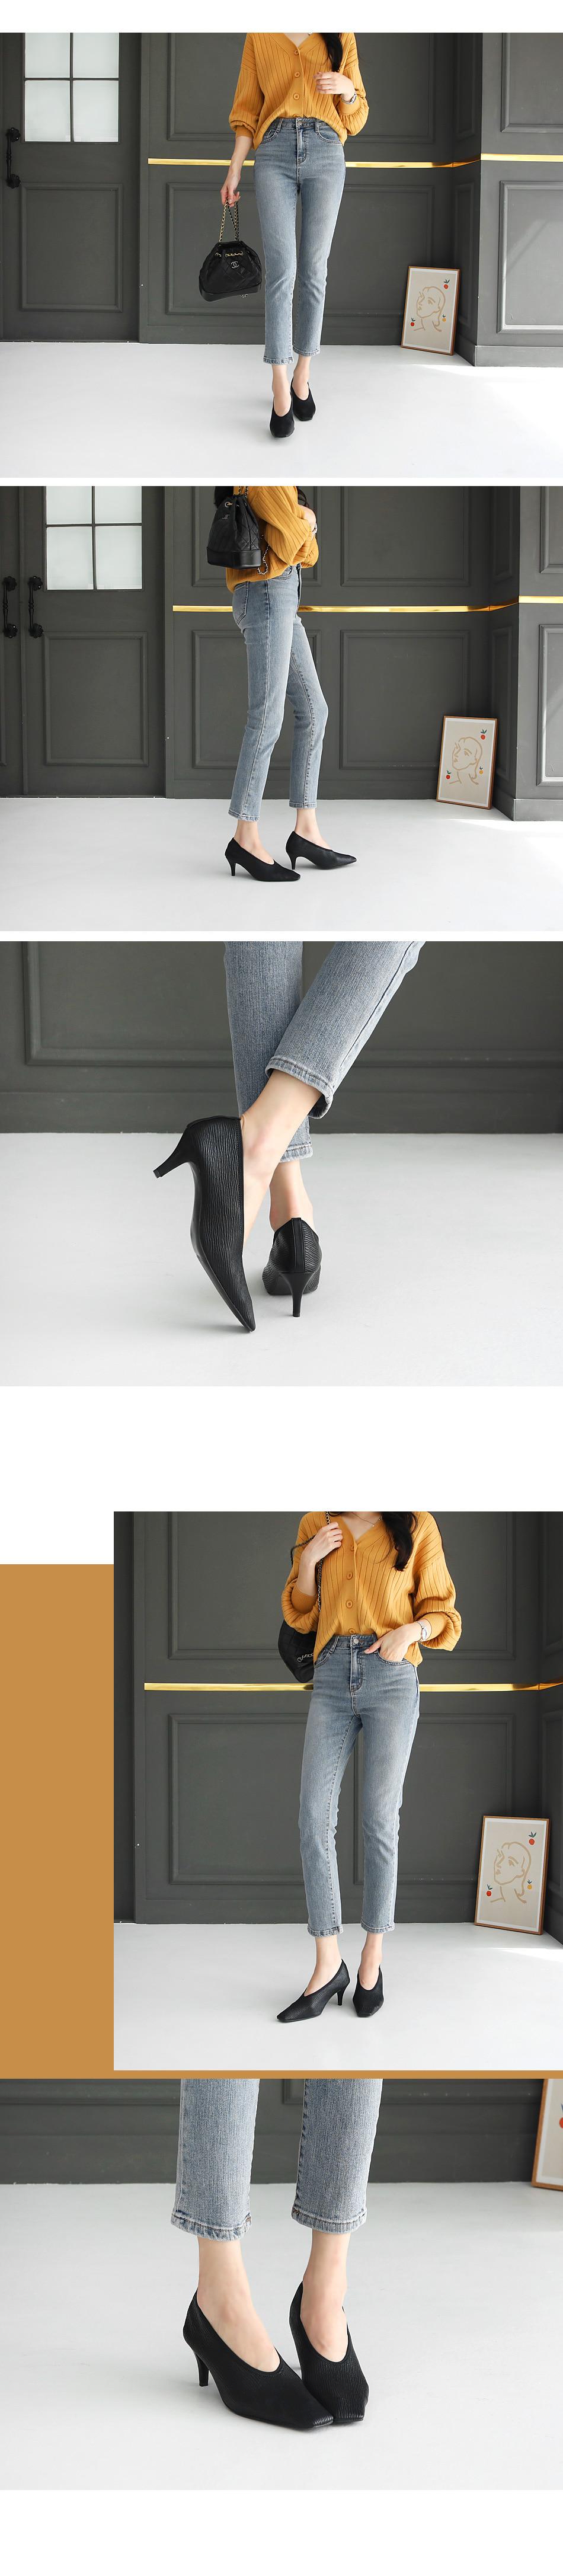 Lupets Banding Middle Heel Pumps 6cm